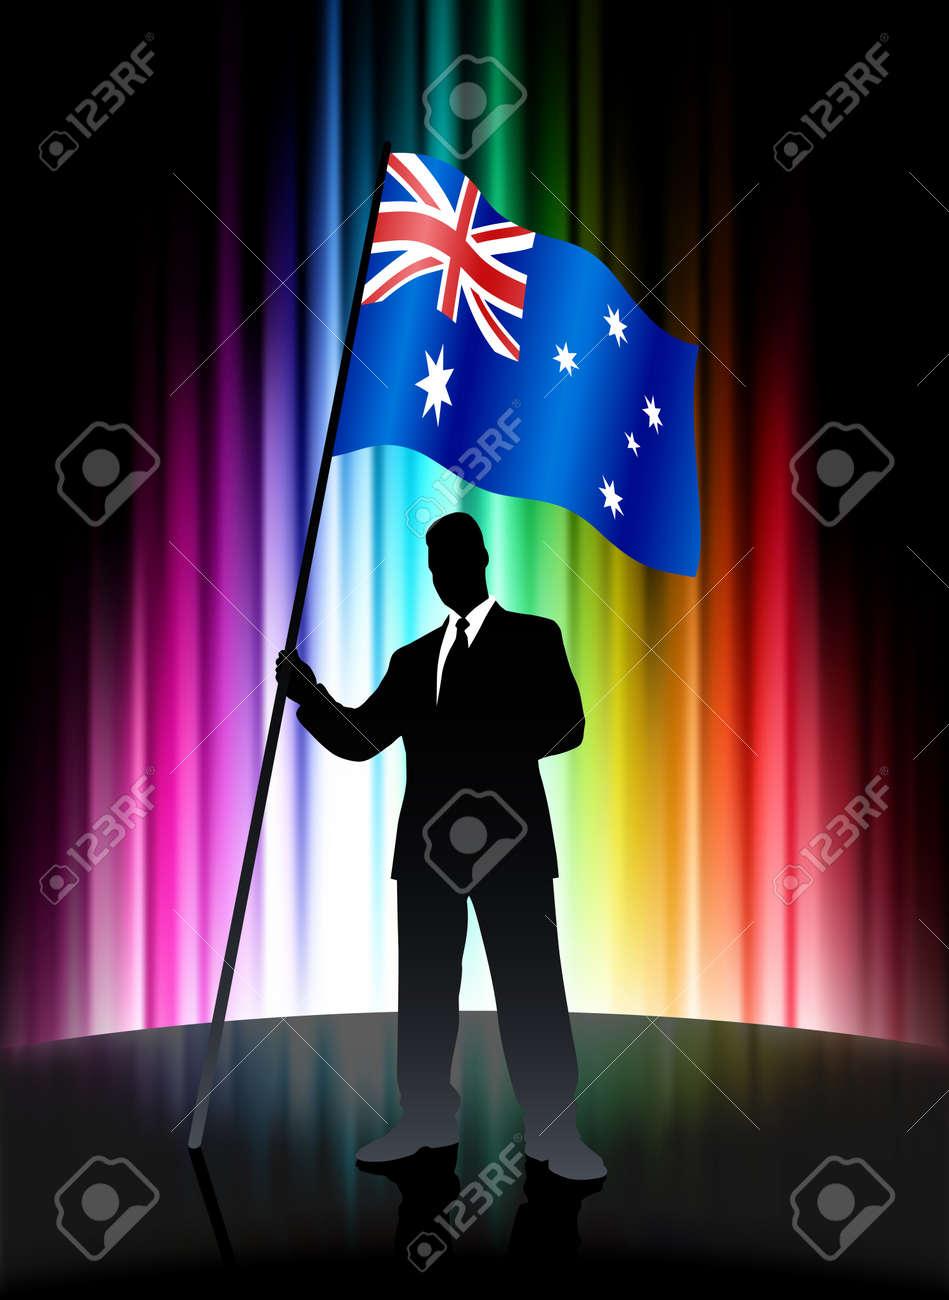 Australia Flag with Businessman on Abstract Spectrum BackgroundOriginal Illustration Stock Illustration - 7569235